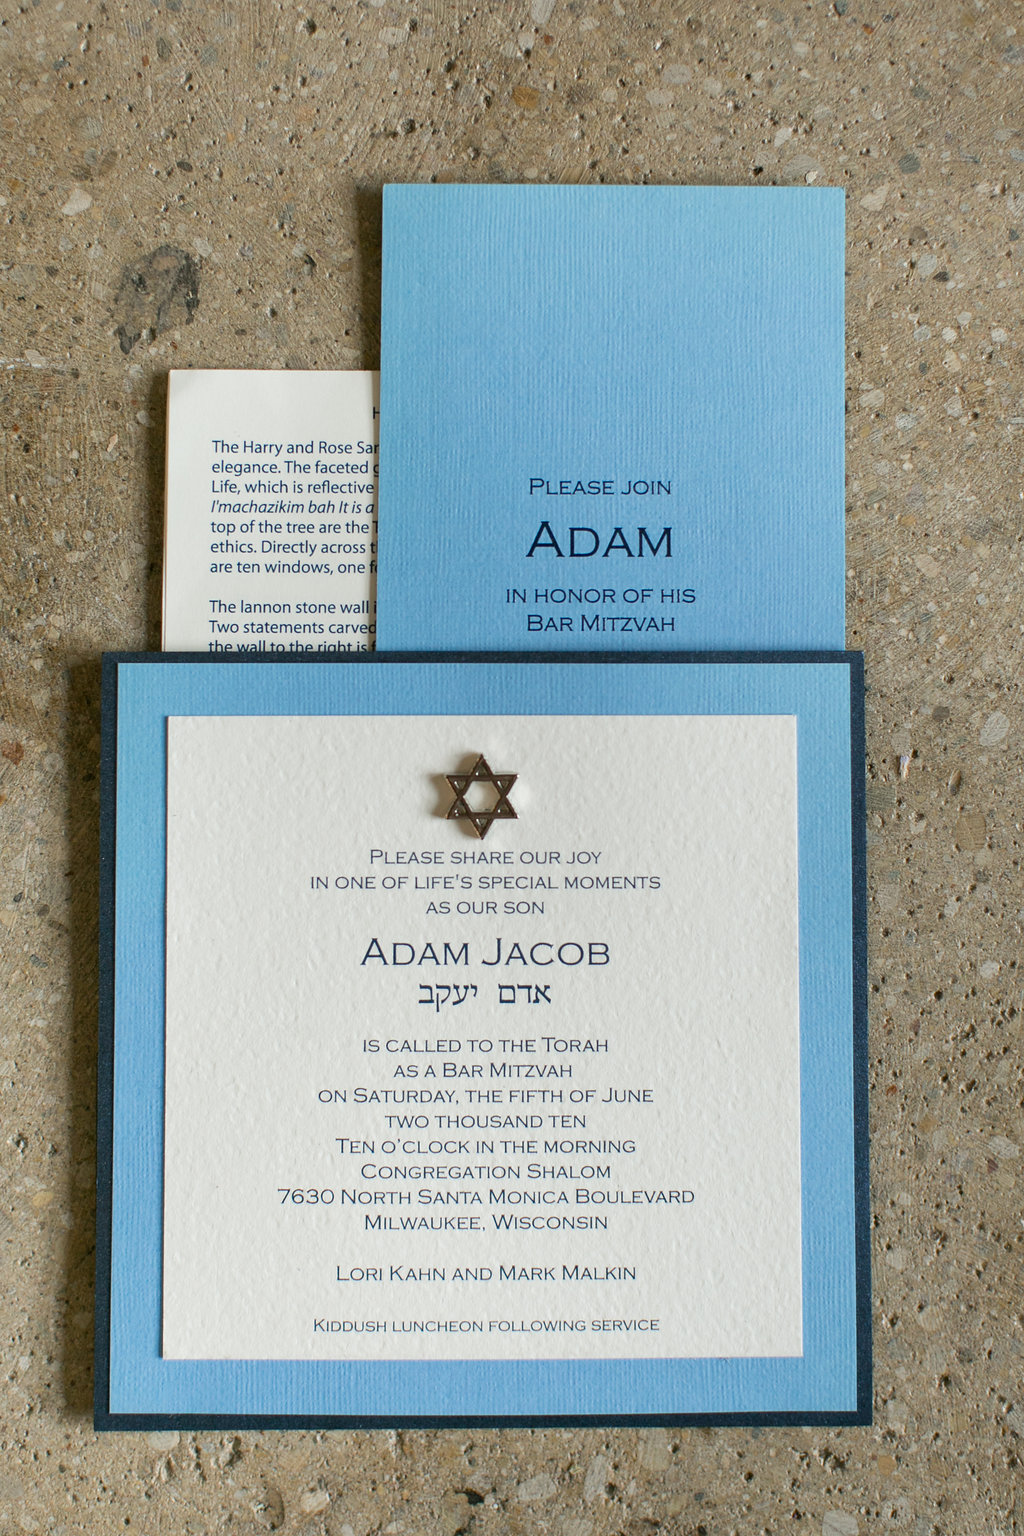 mitzvah_adam5.jpg